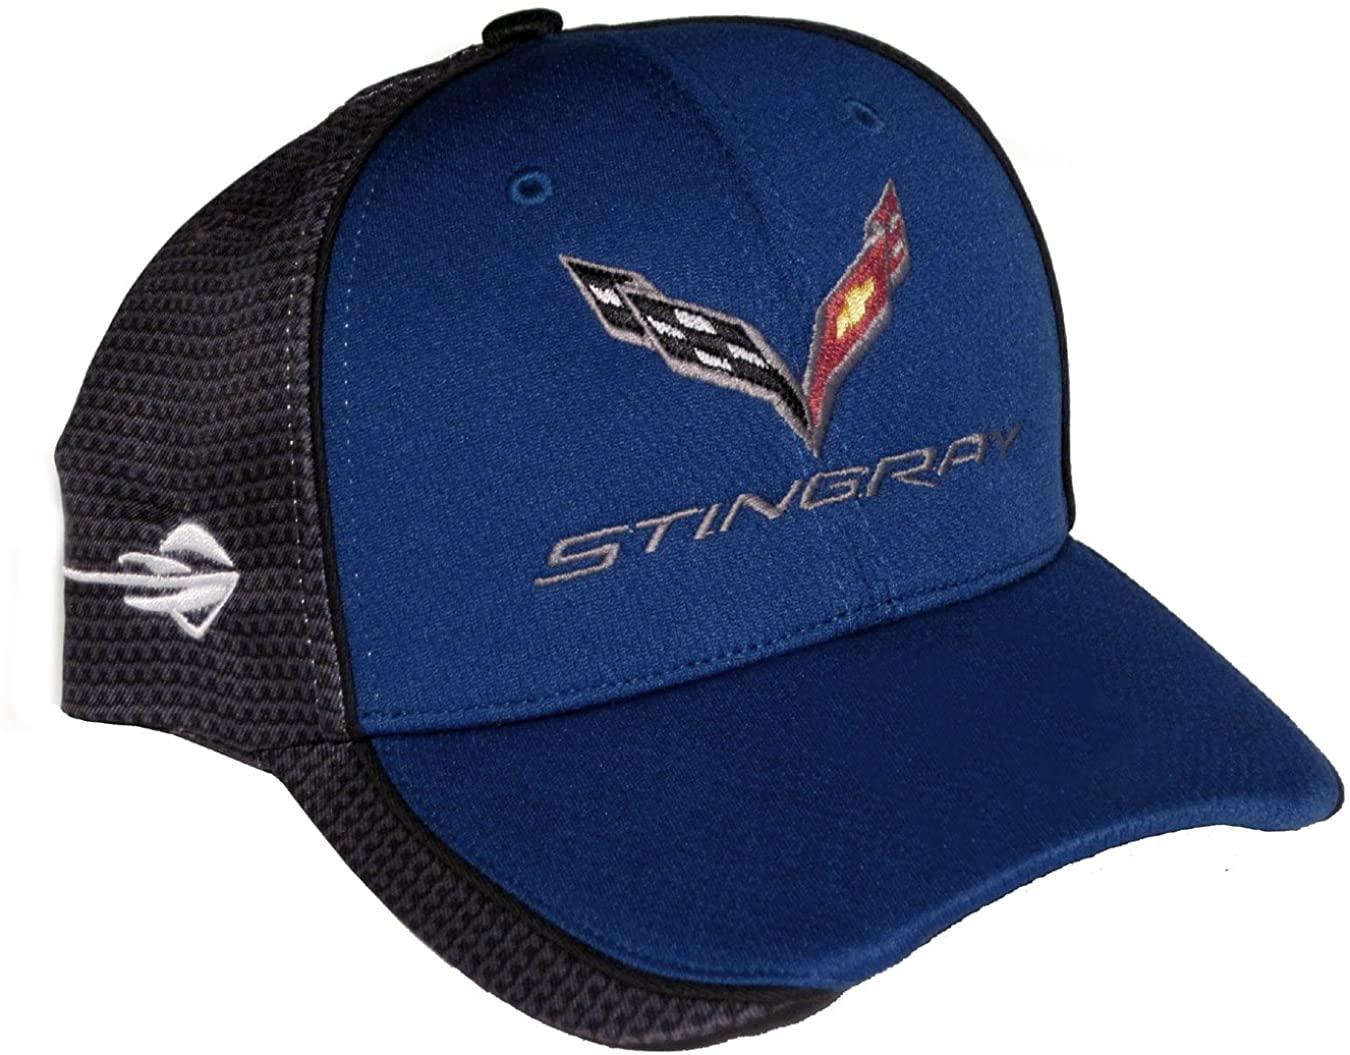 Gregs Automotive C7 Carbon Fiber Print Blue/Gray Logo Hat Cap Compatible with Chevrolet Chevy Corvette - Bundle with Driving Style Decal